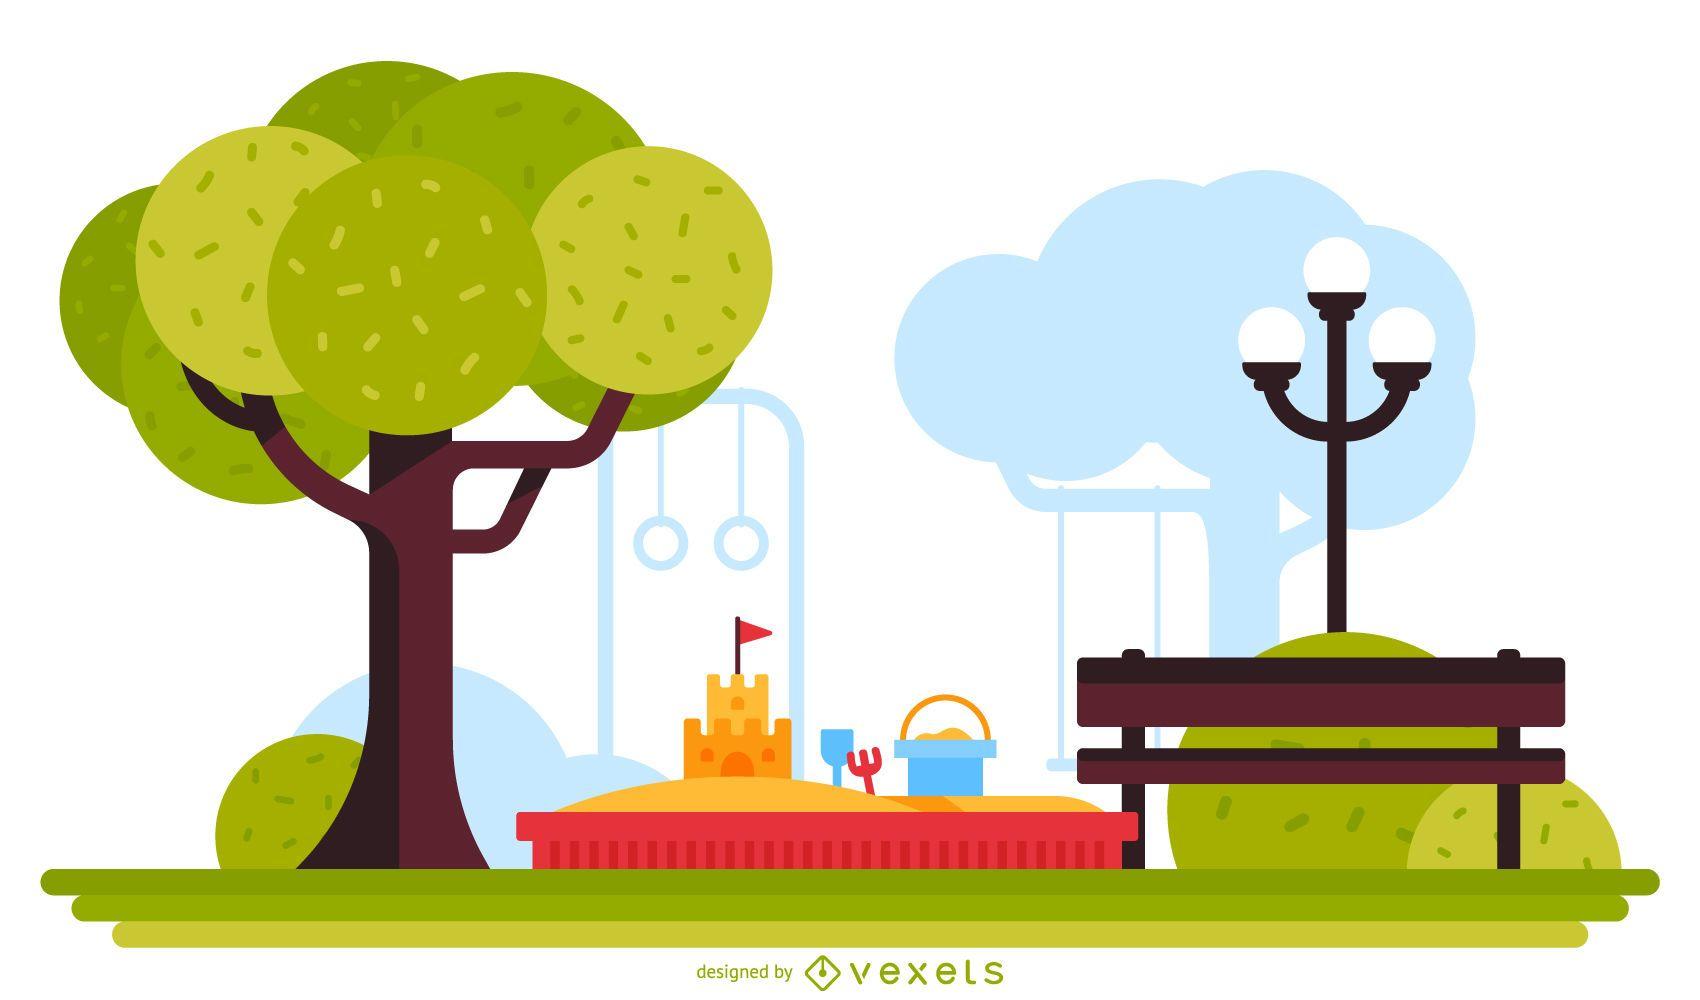 Park sandpit playground illustration